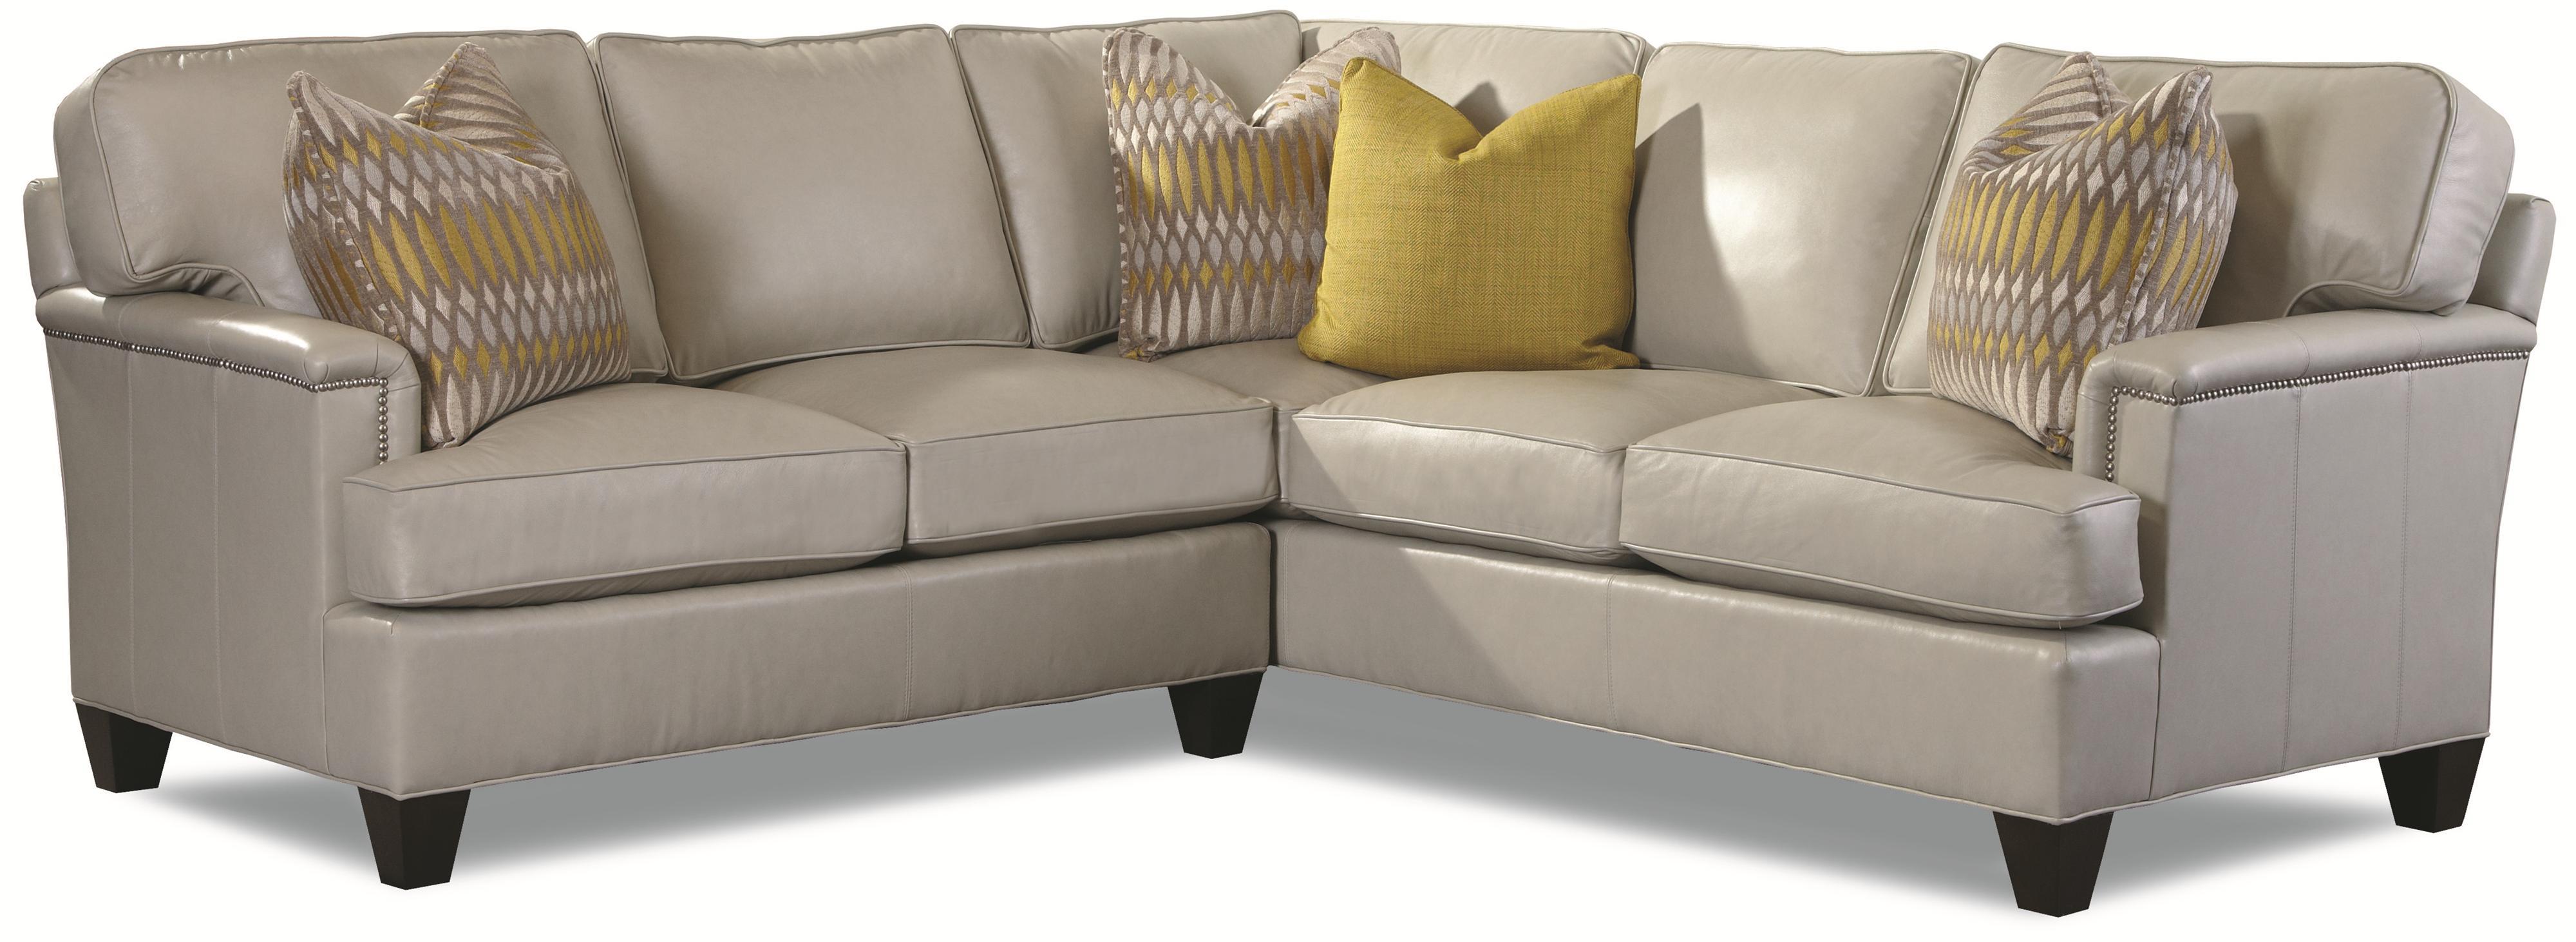 2041 Sectional by Geoffrey Alexander at Sprintz Furniture